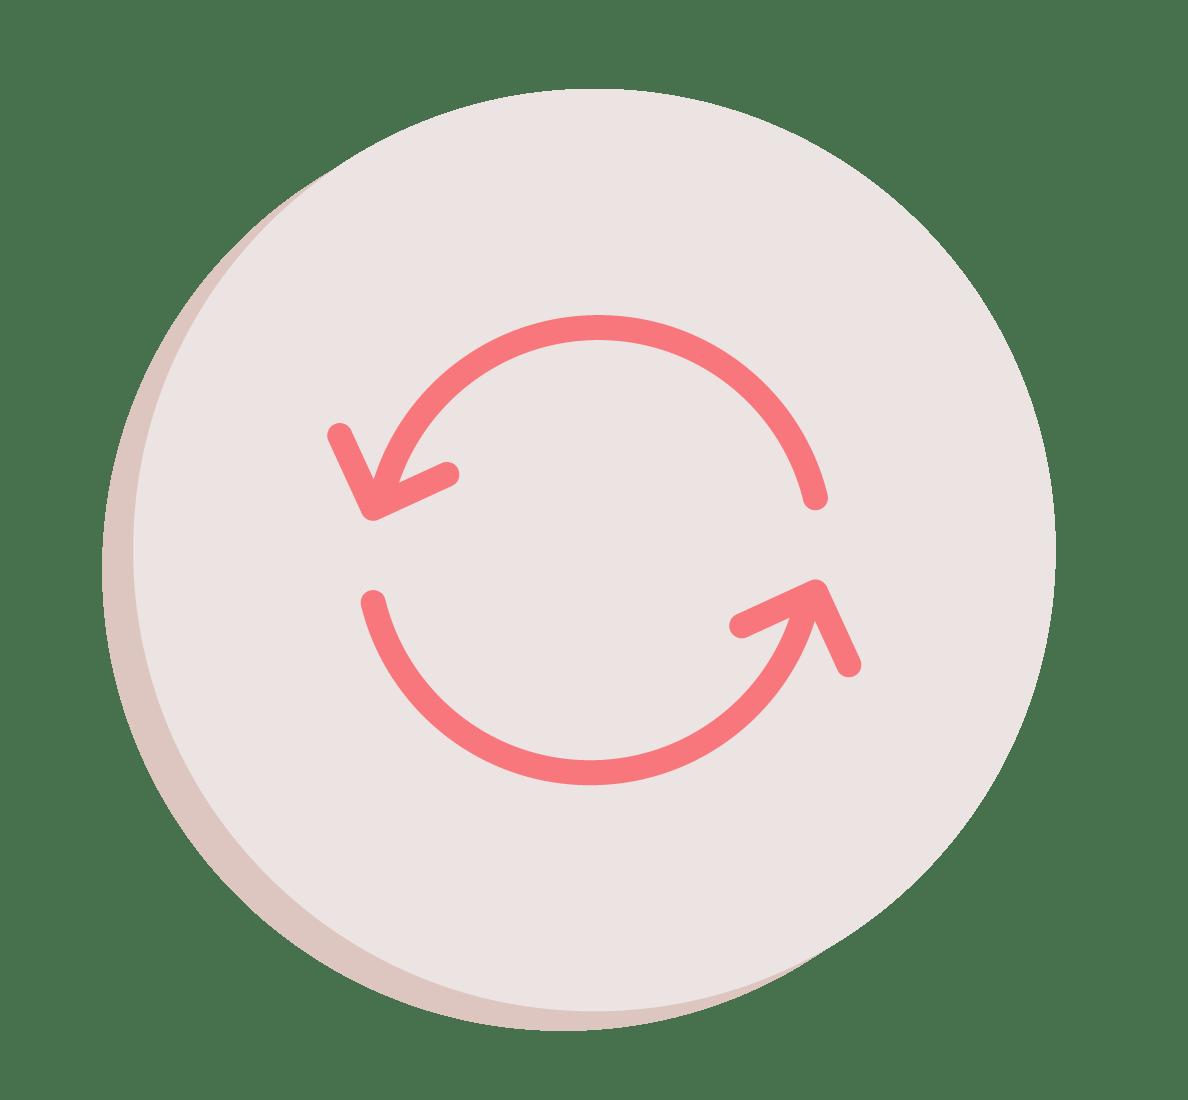 Recurring meeting icon